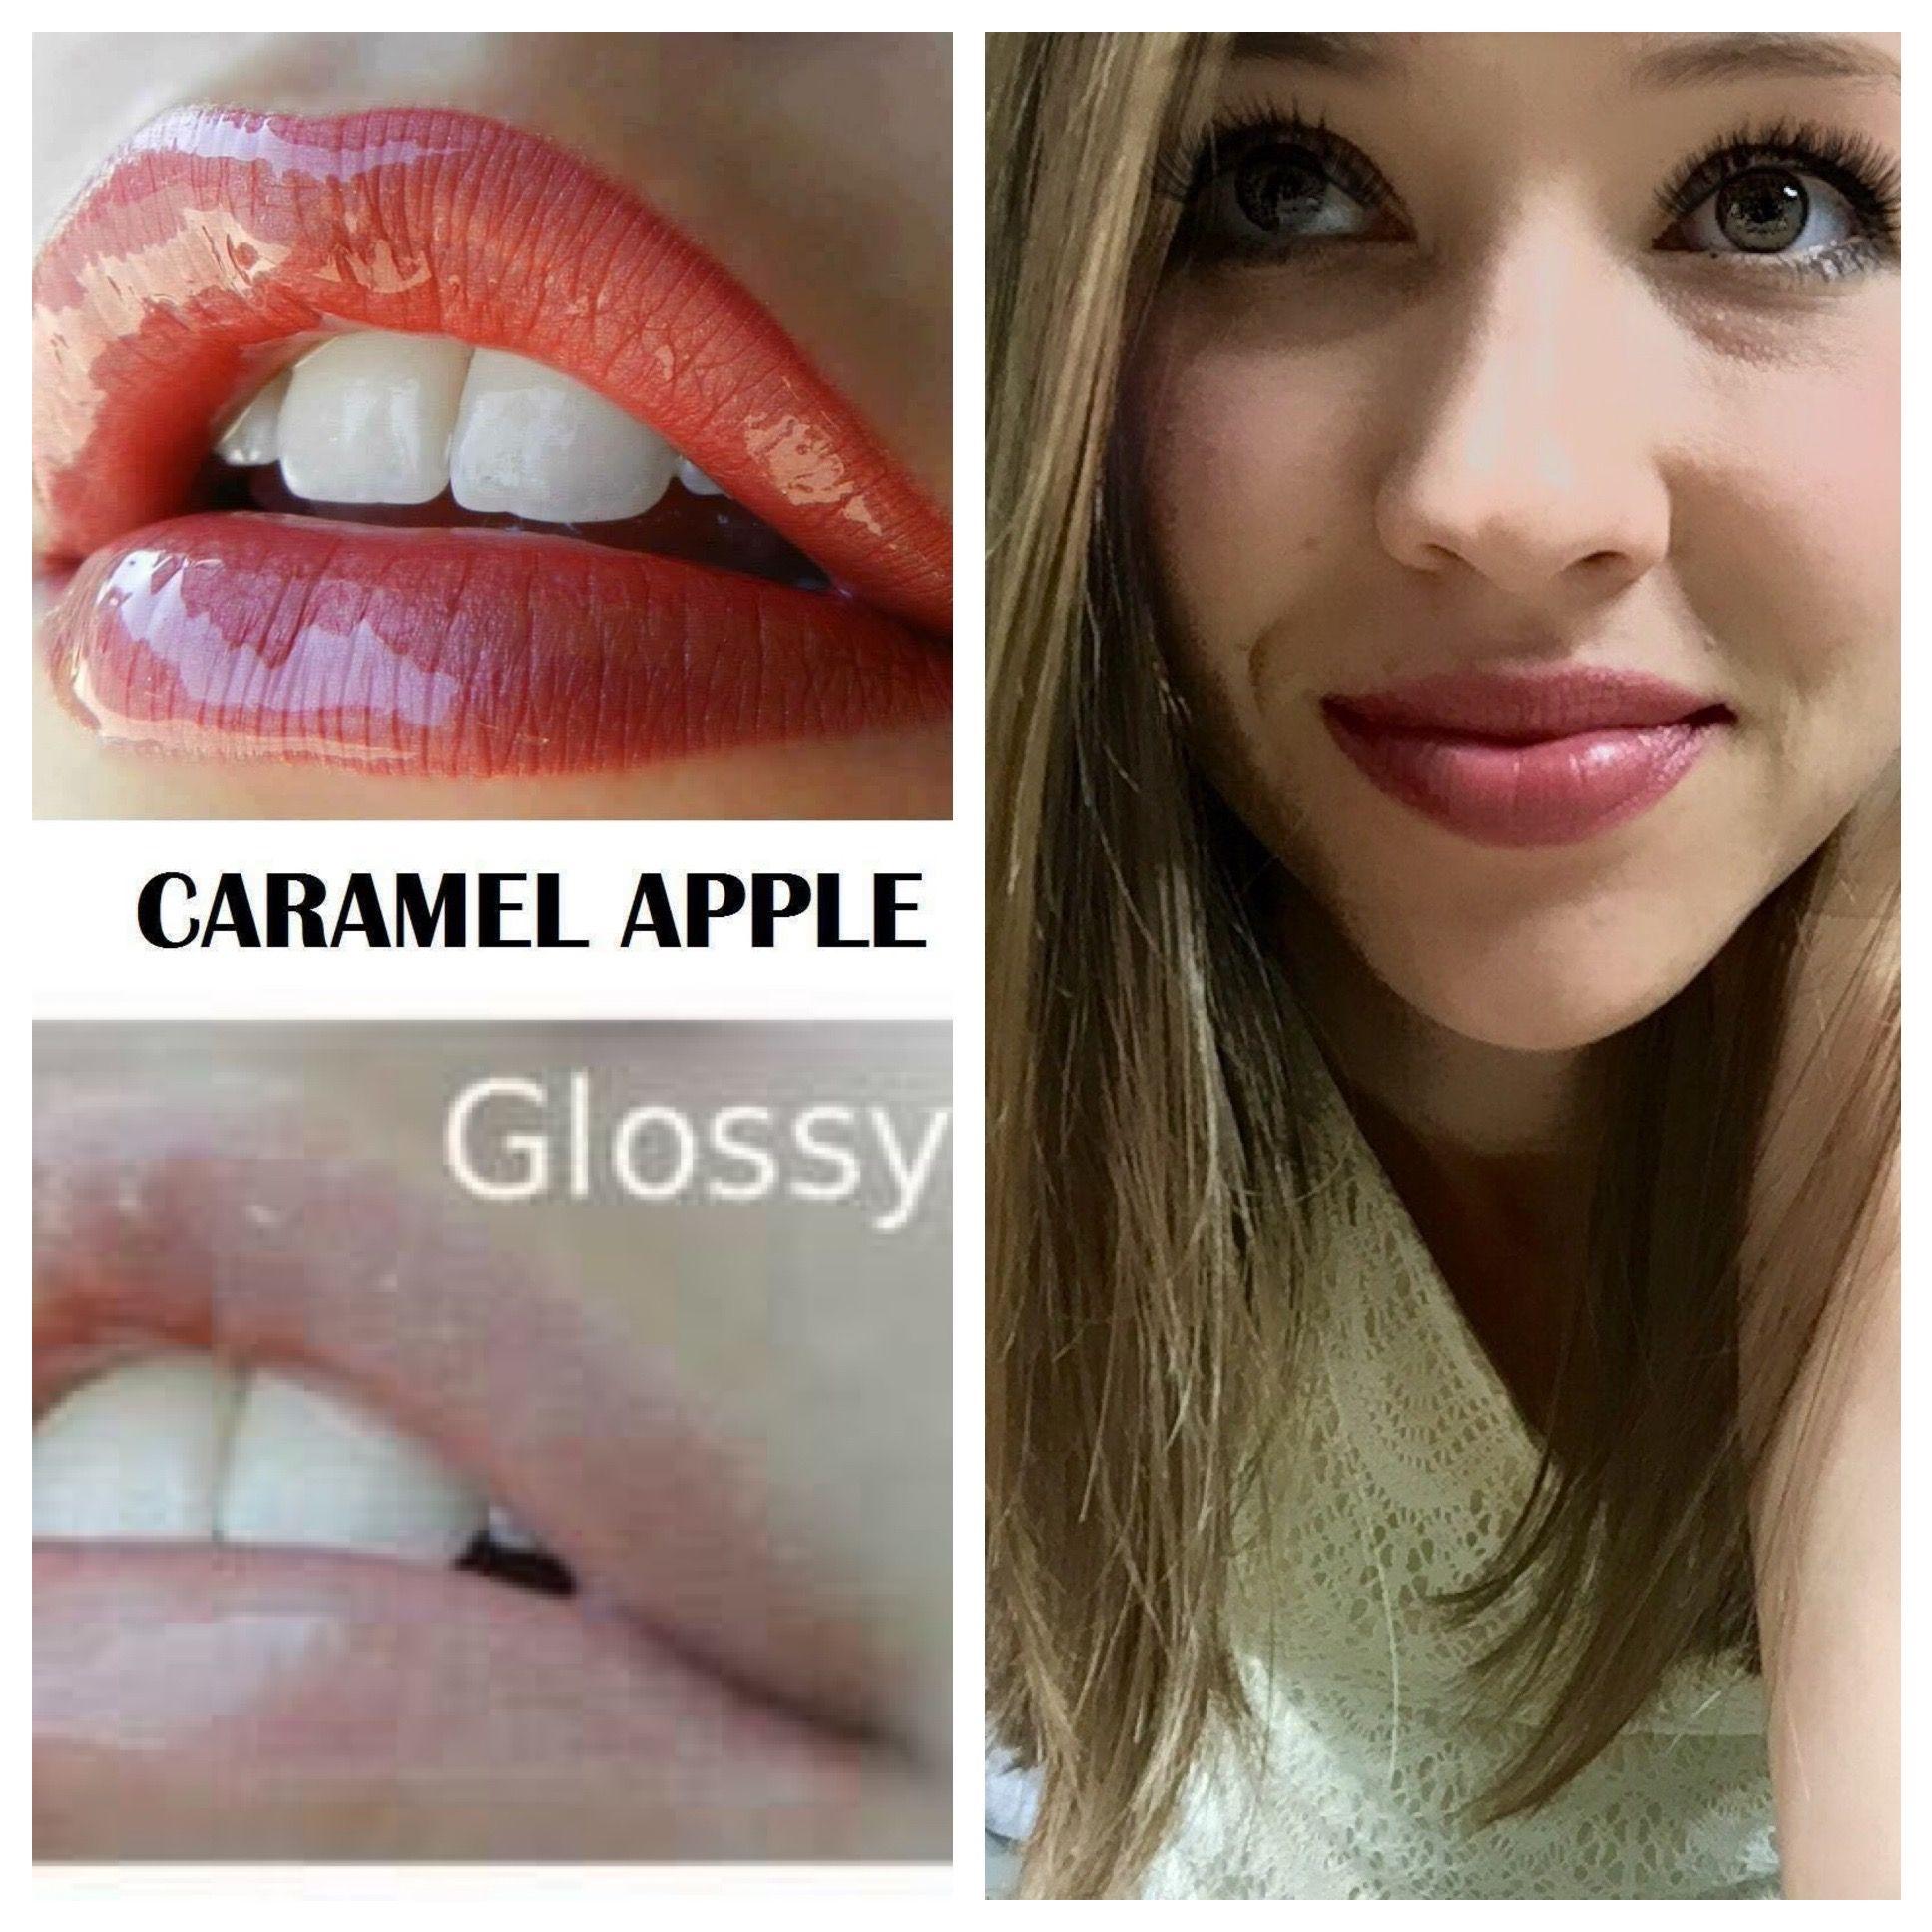 LipSense Caramel Apple & Glossy Gloss